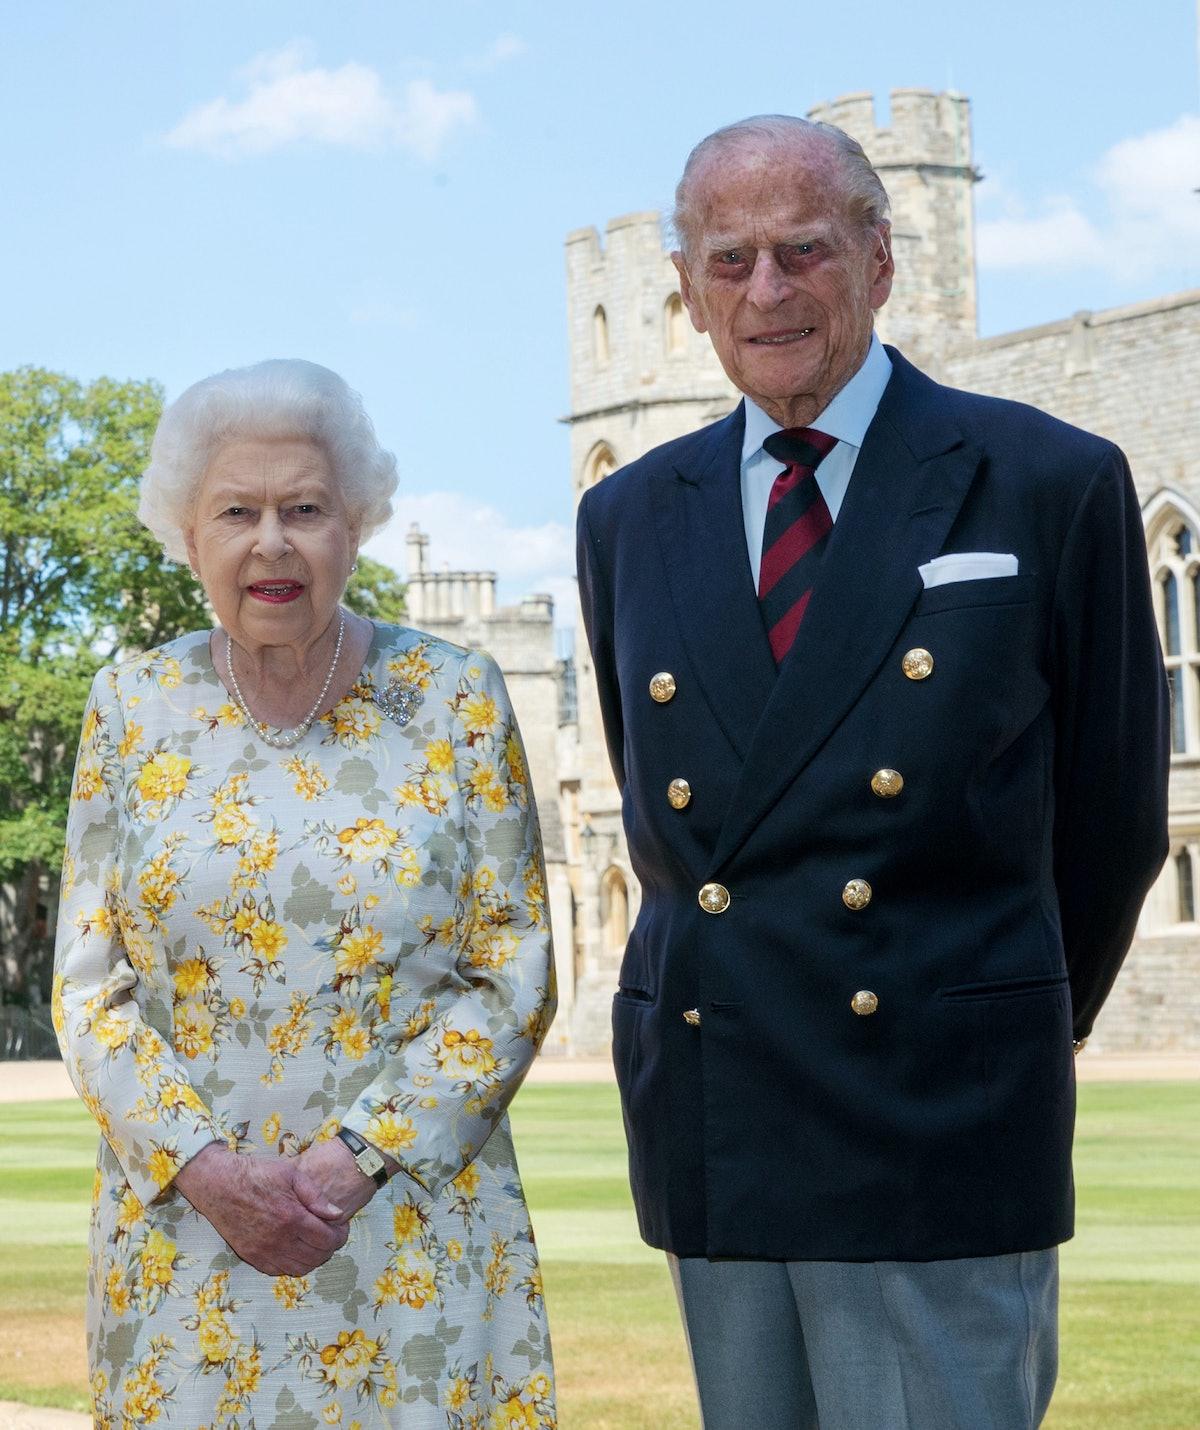 Queen Elizabeth II and the Duke of Edinburgh pictured 1/6/2020 in the quadrangle of Windsor Castle a...